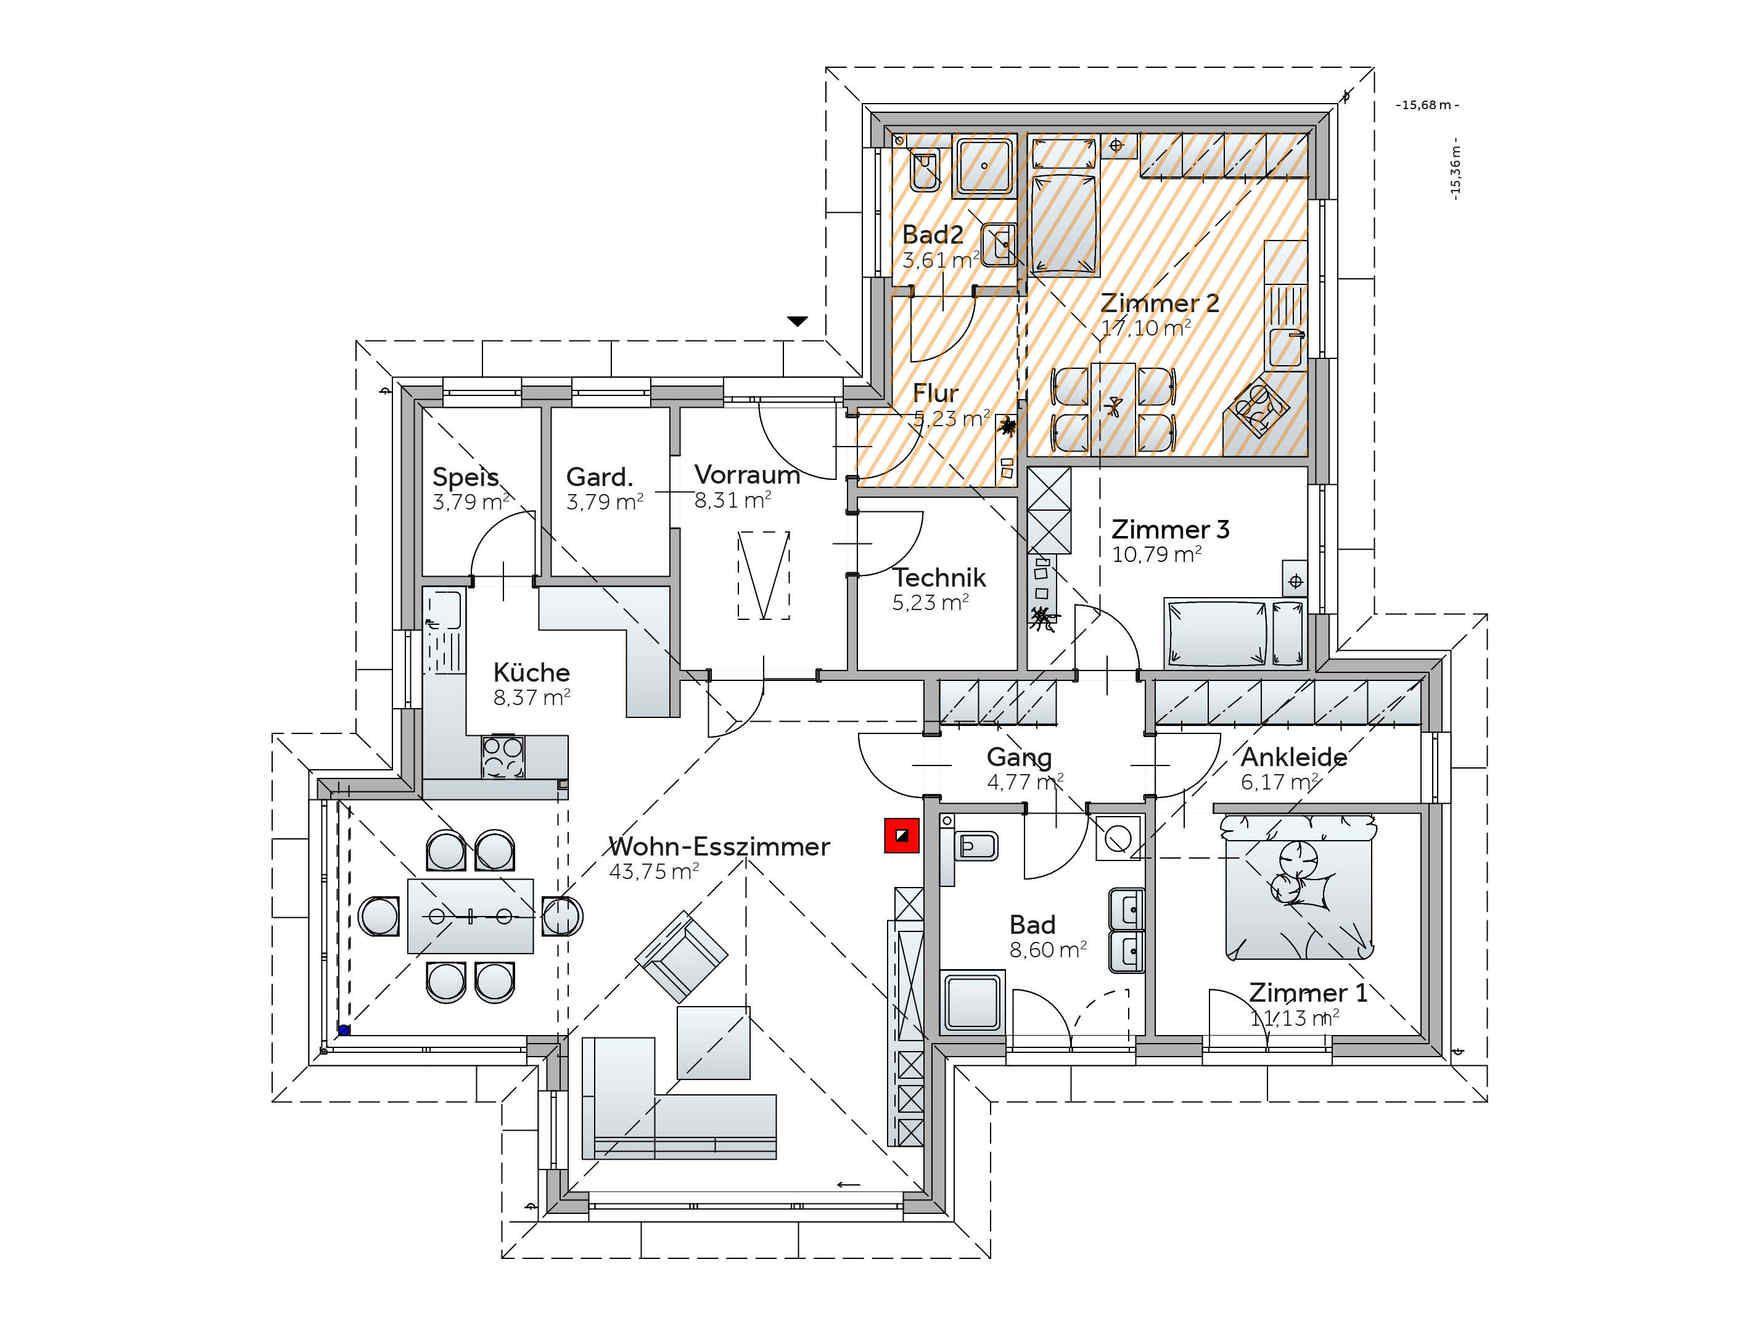 bildergebnis f r grundrisse bungalow 140 qm bungalows pinterest bungalow. Black Bedroom Furniture Sets. Home Design Ideas